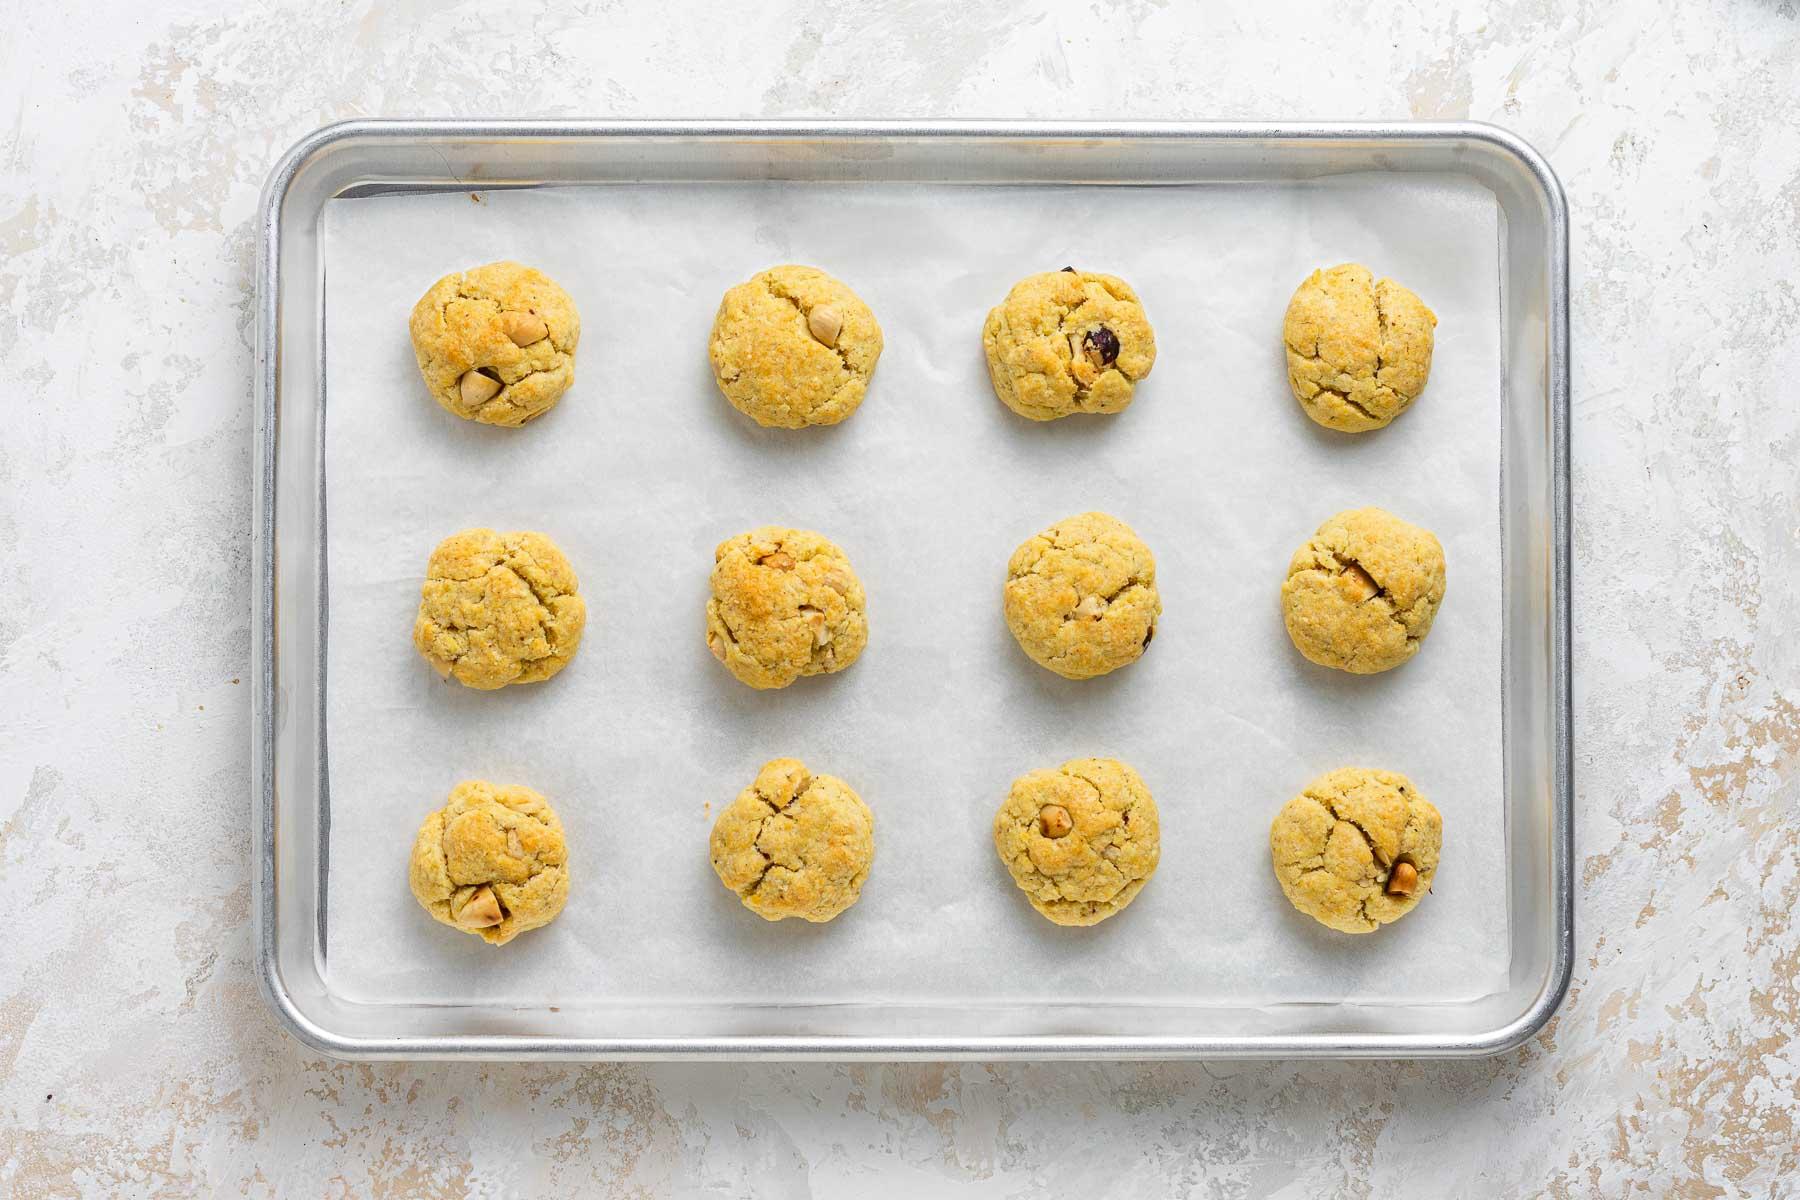 Baked hazelnut cookies on sheet pan.